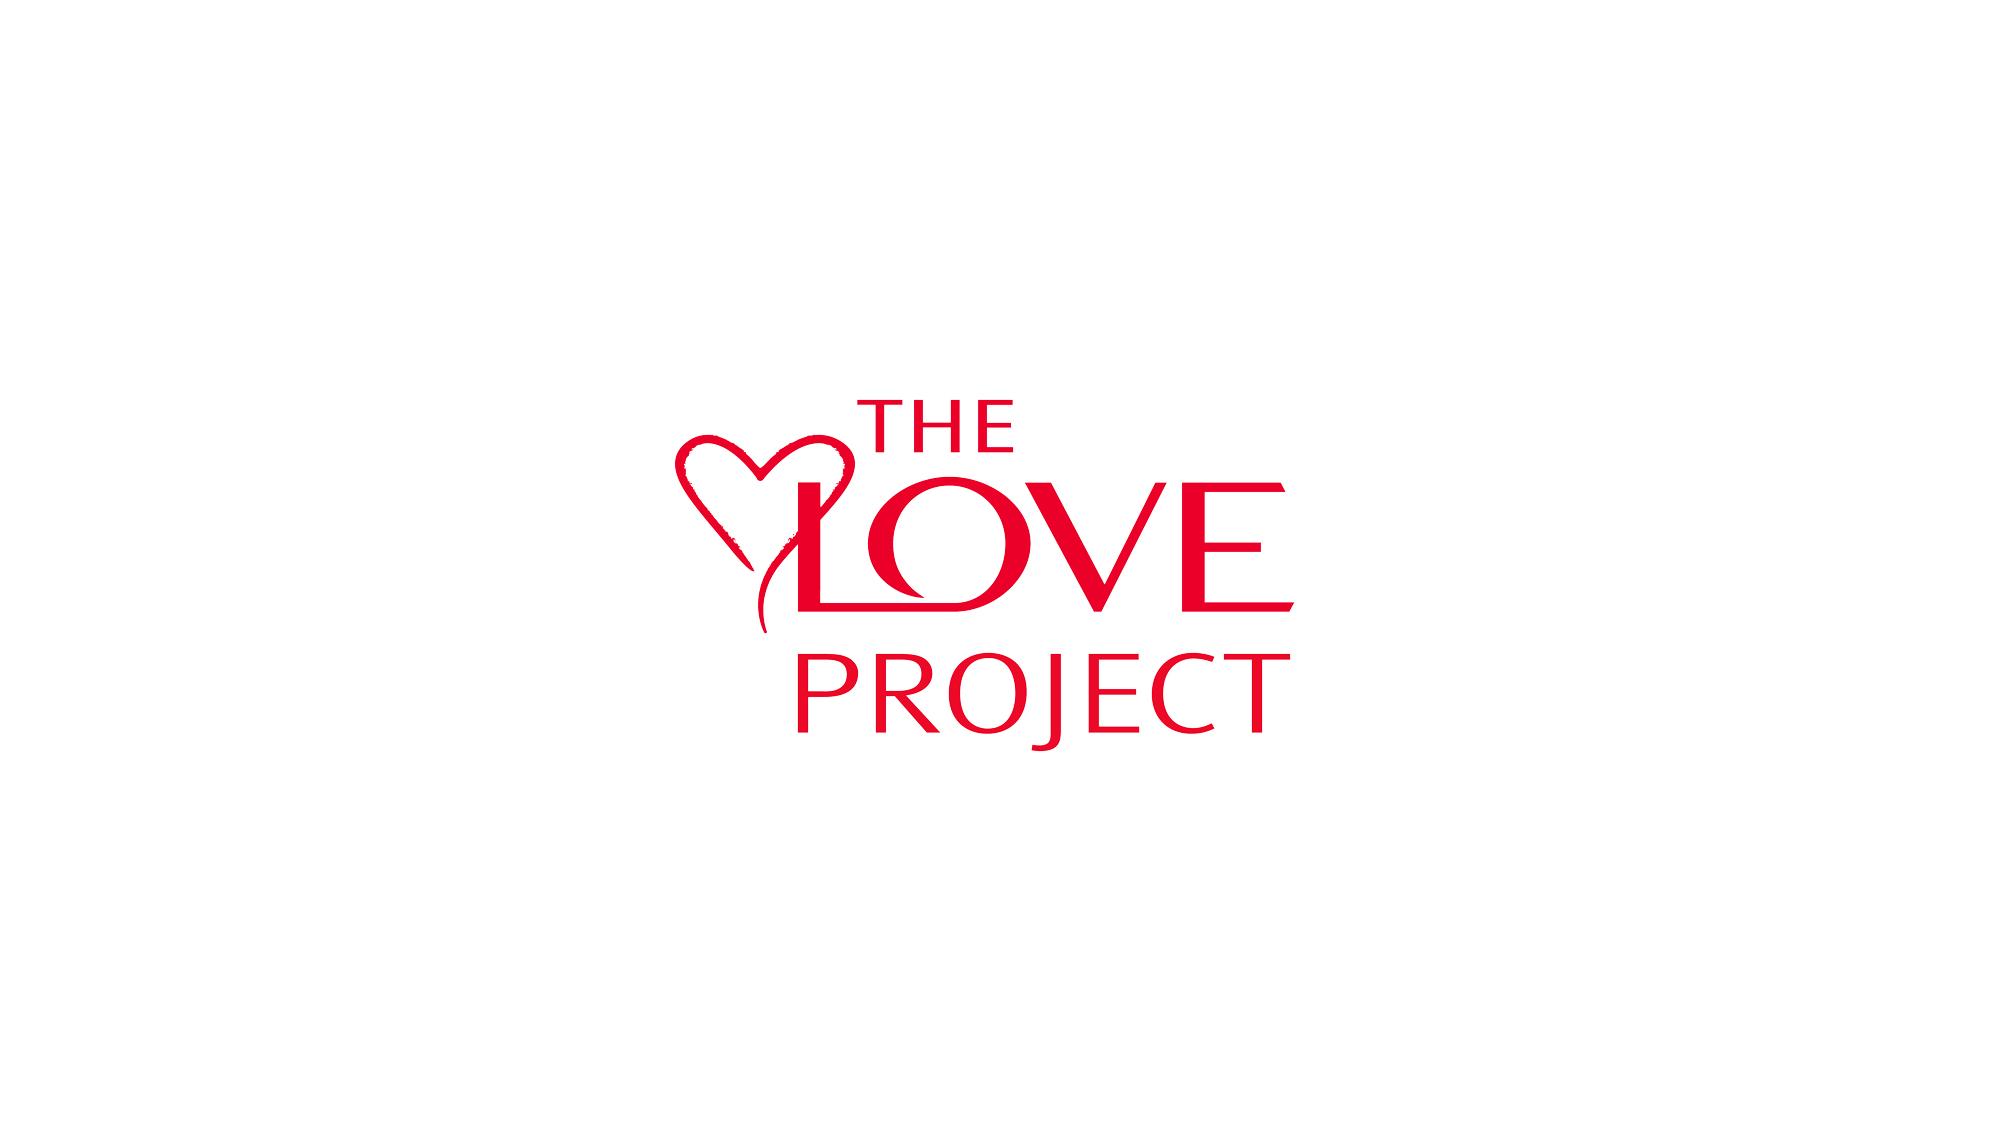 Trevor Project is a Founding Nonprofit Partner of Revlon's Love